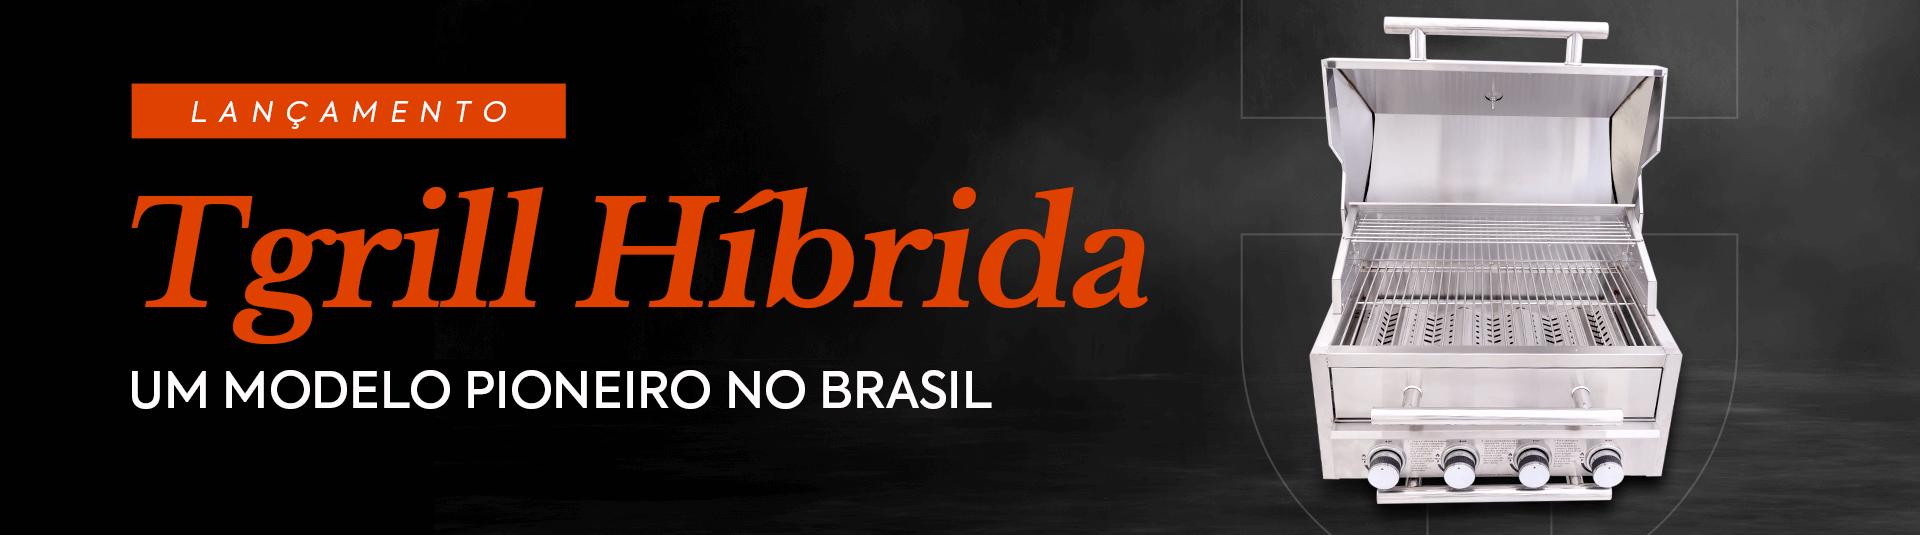 Banner - TGRILL Hibrida